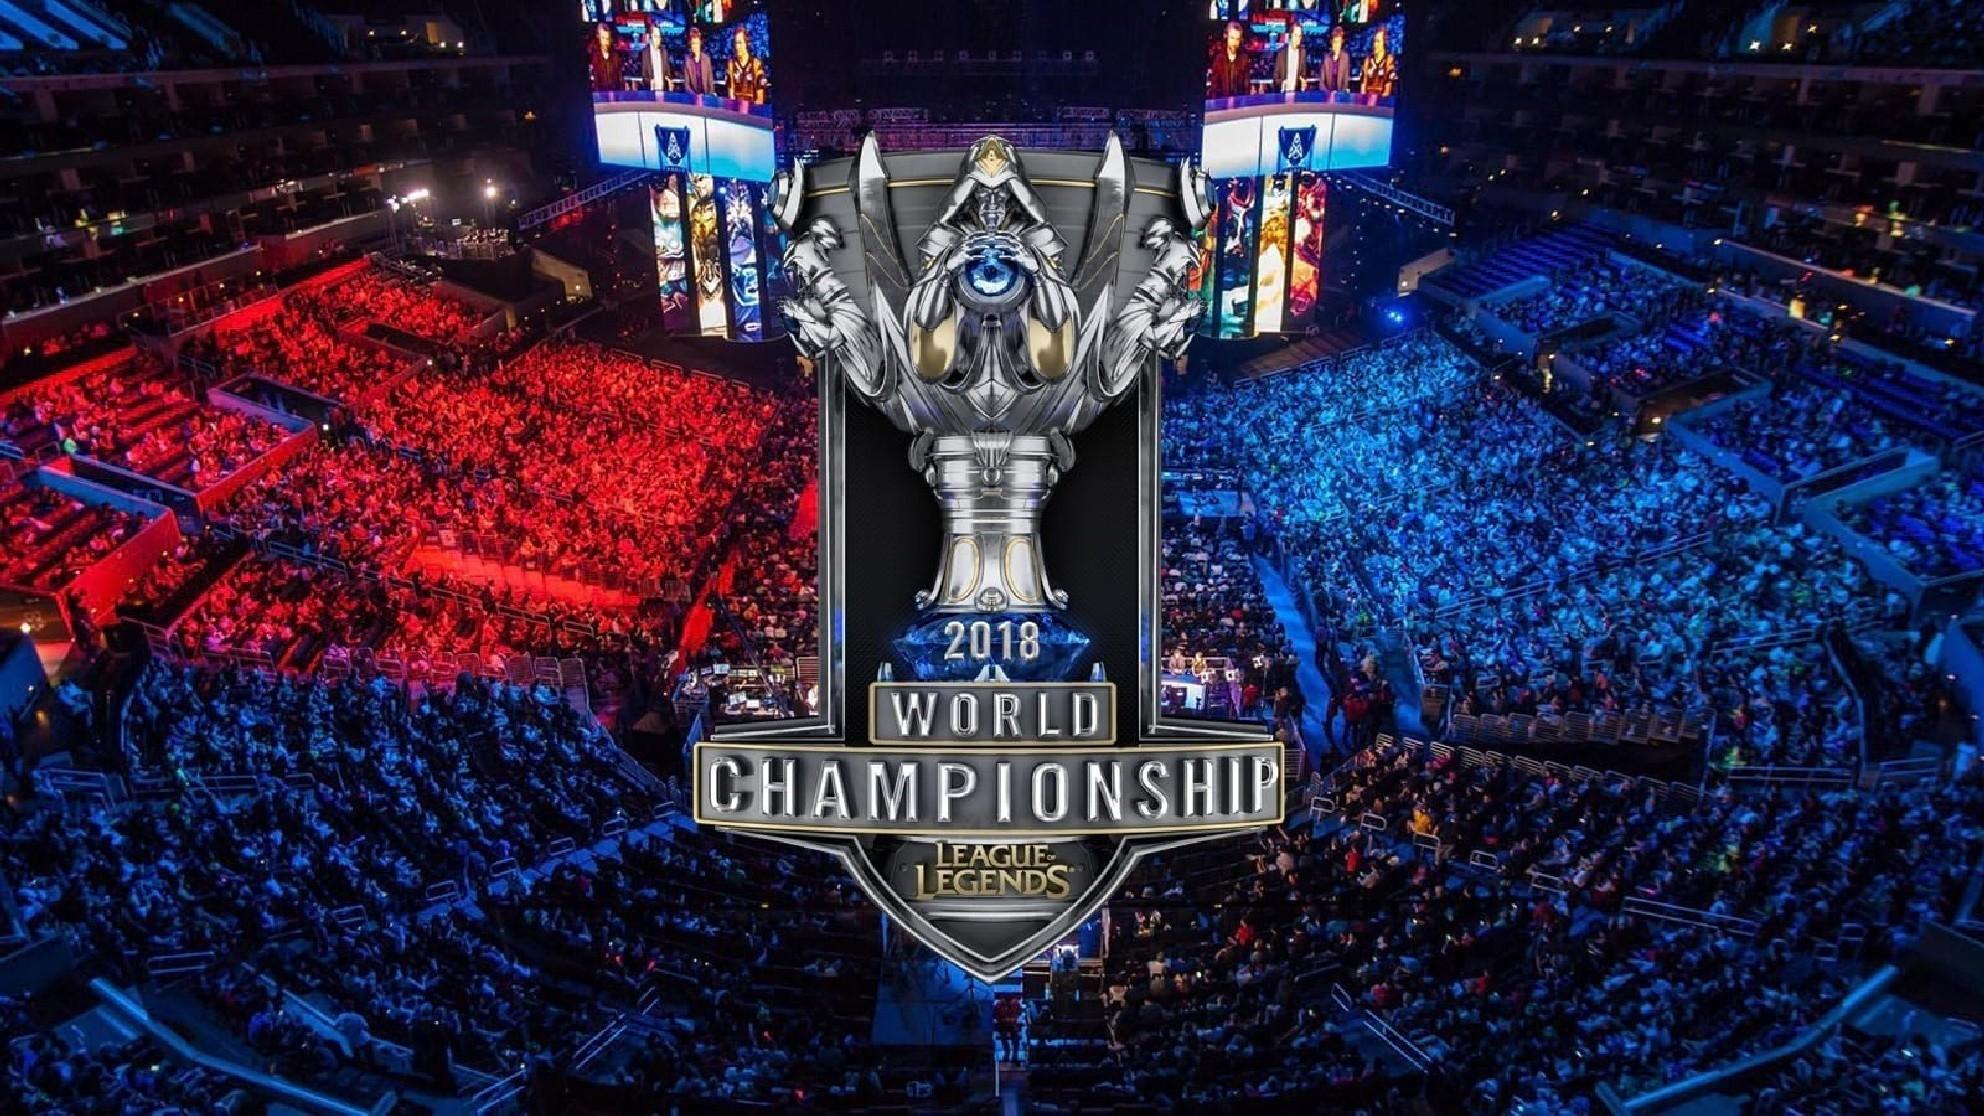 Quarterfinals of the 2018 League of Legends World Championship